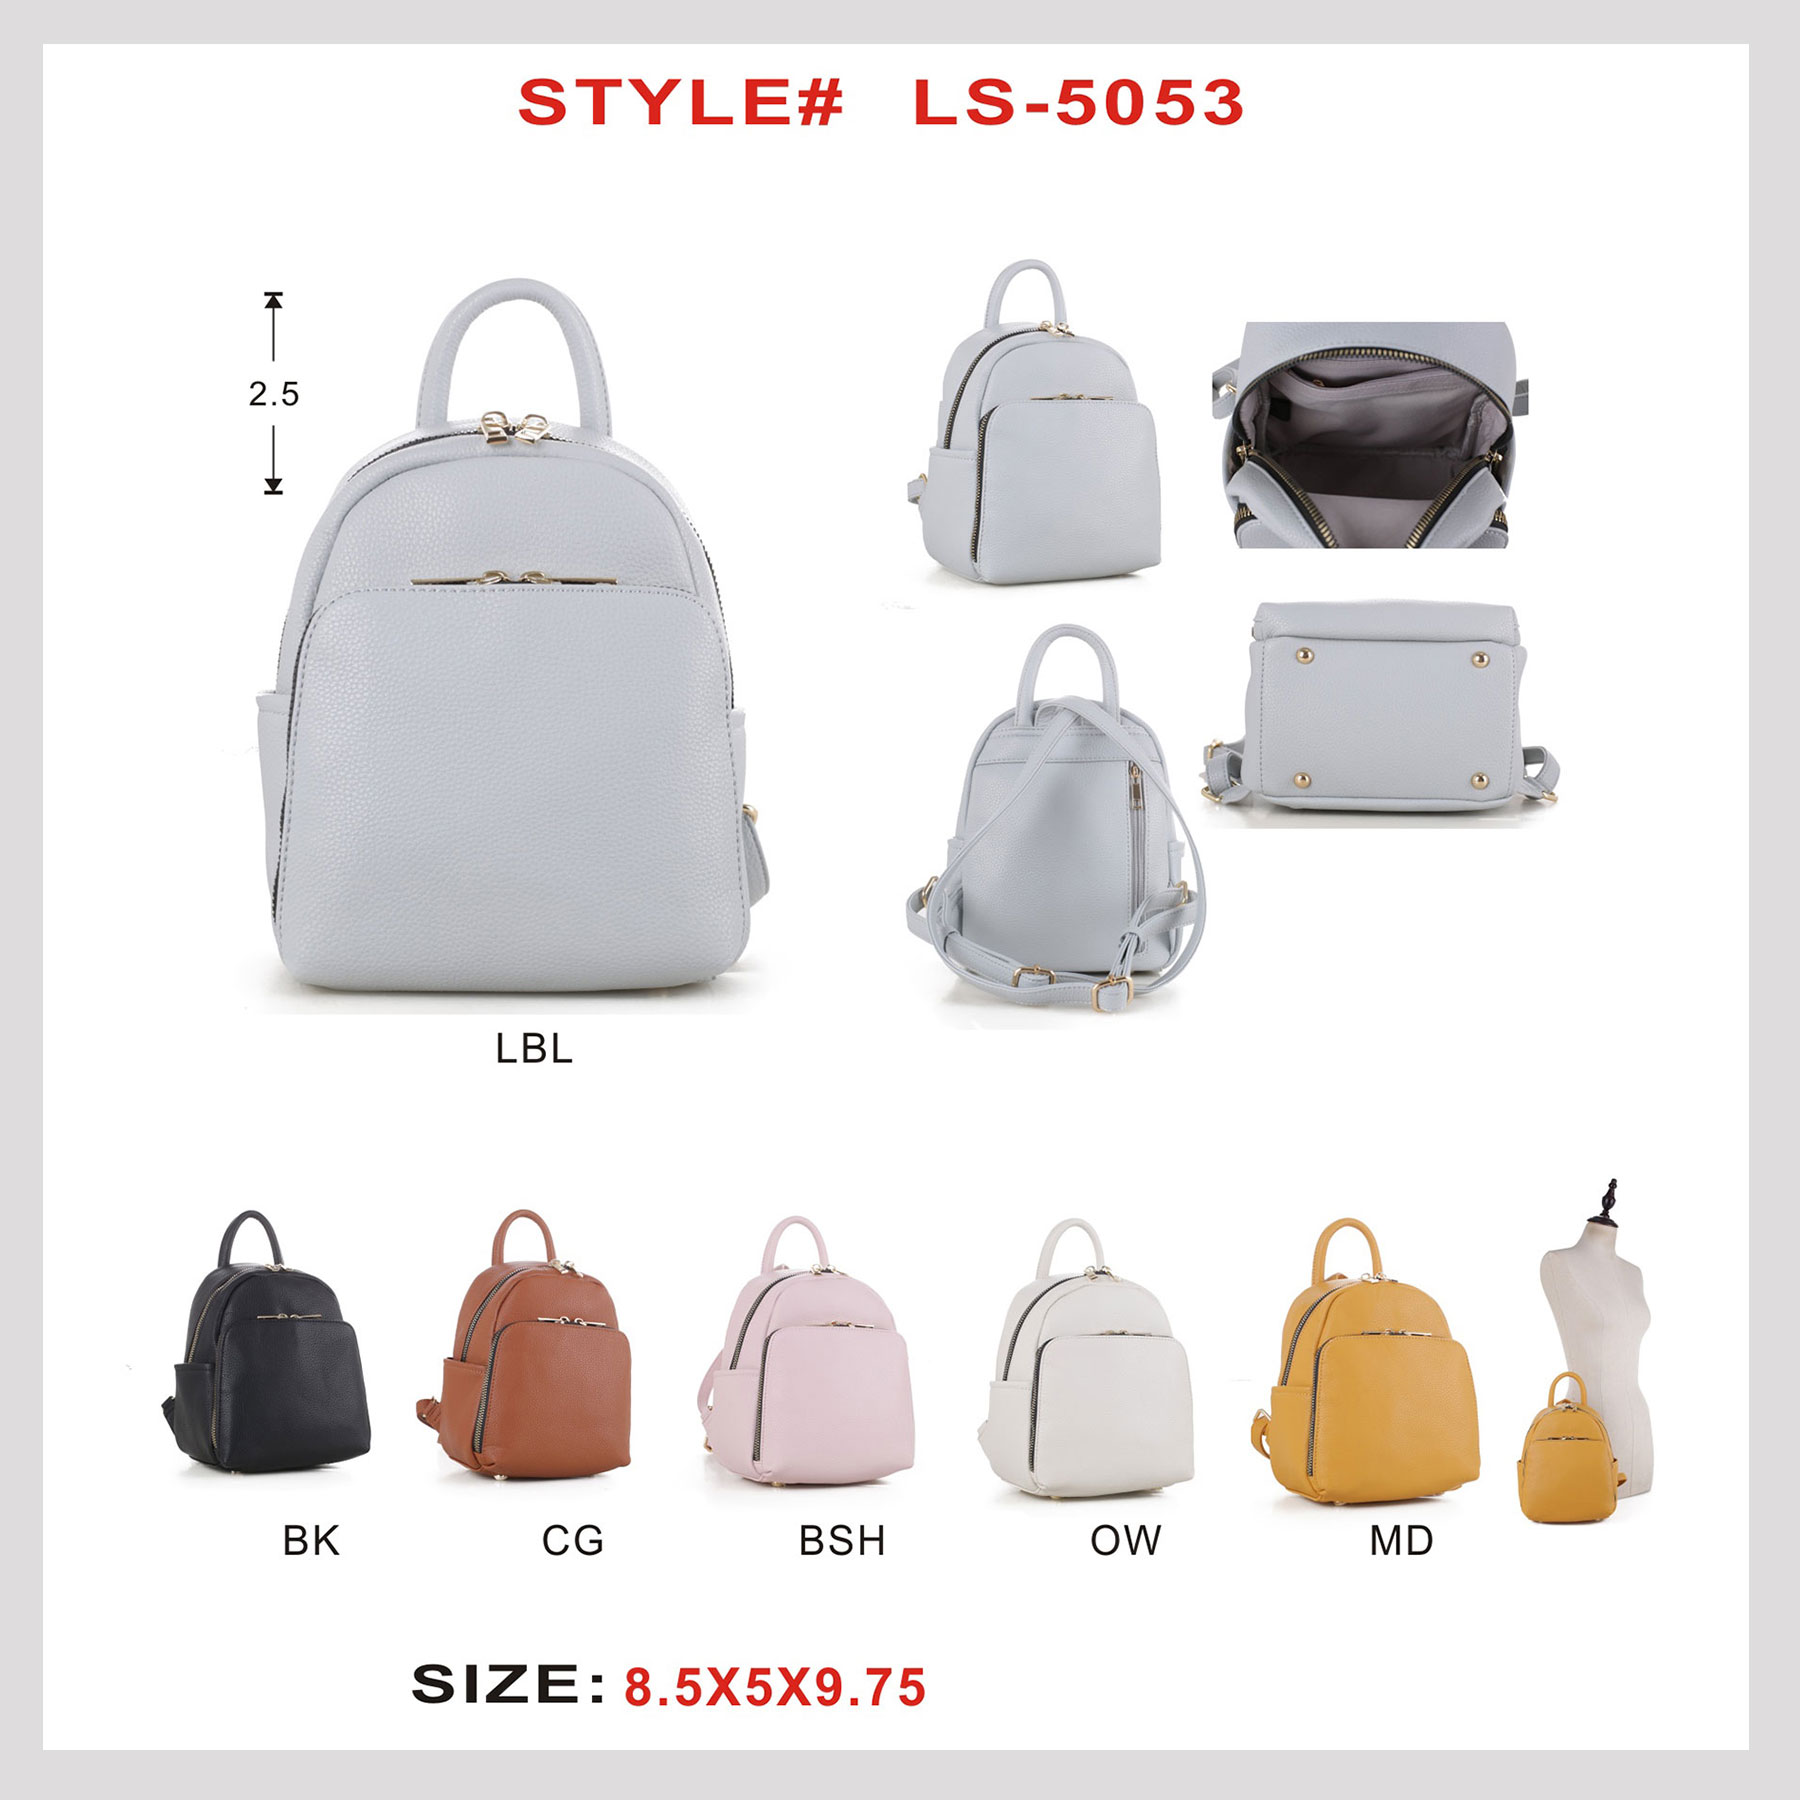 LS-5053.jpg